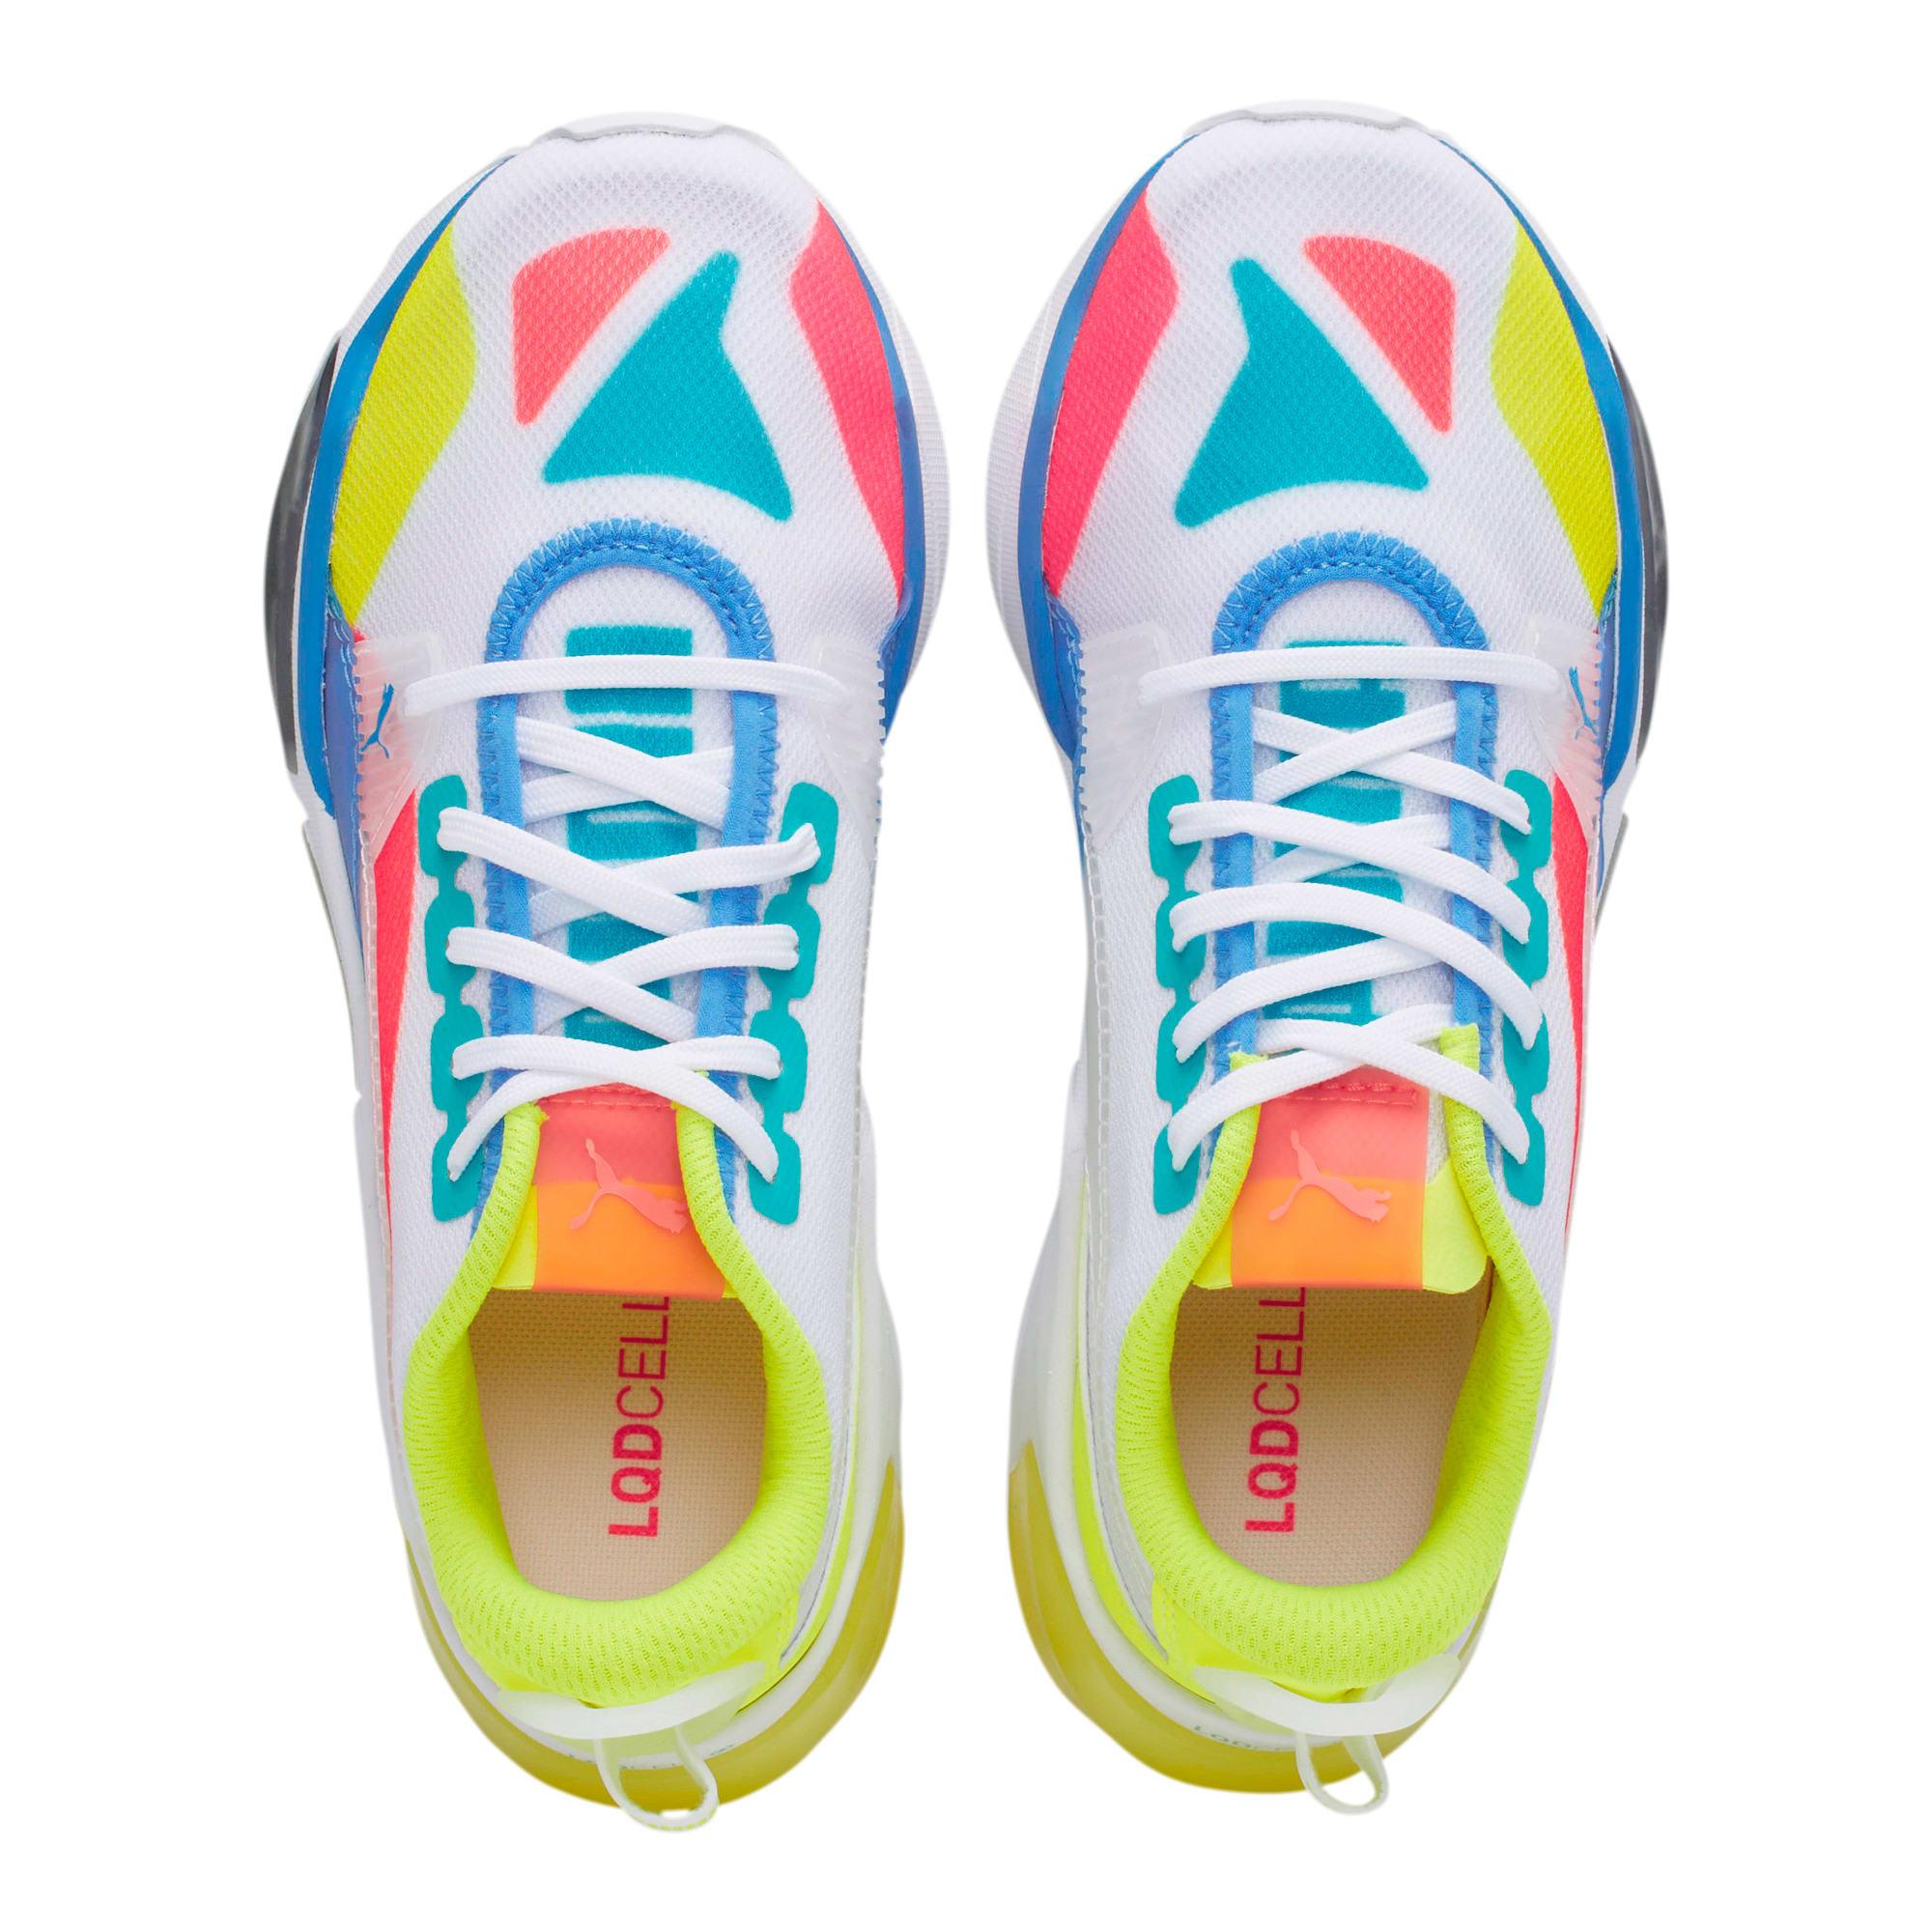 Thumbnail 6 of LQDCELL Optic Sheer Training Shoes JR, White-Nrgy Rose-Yellow, medium